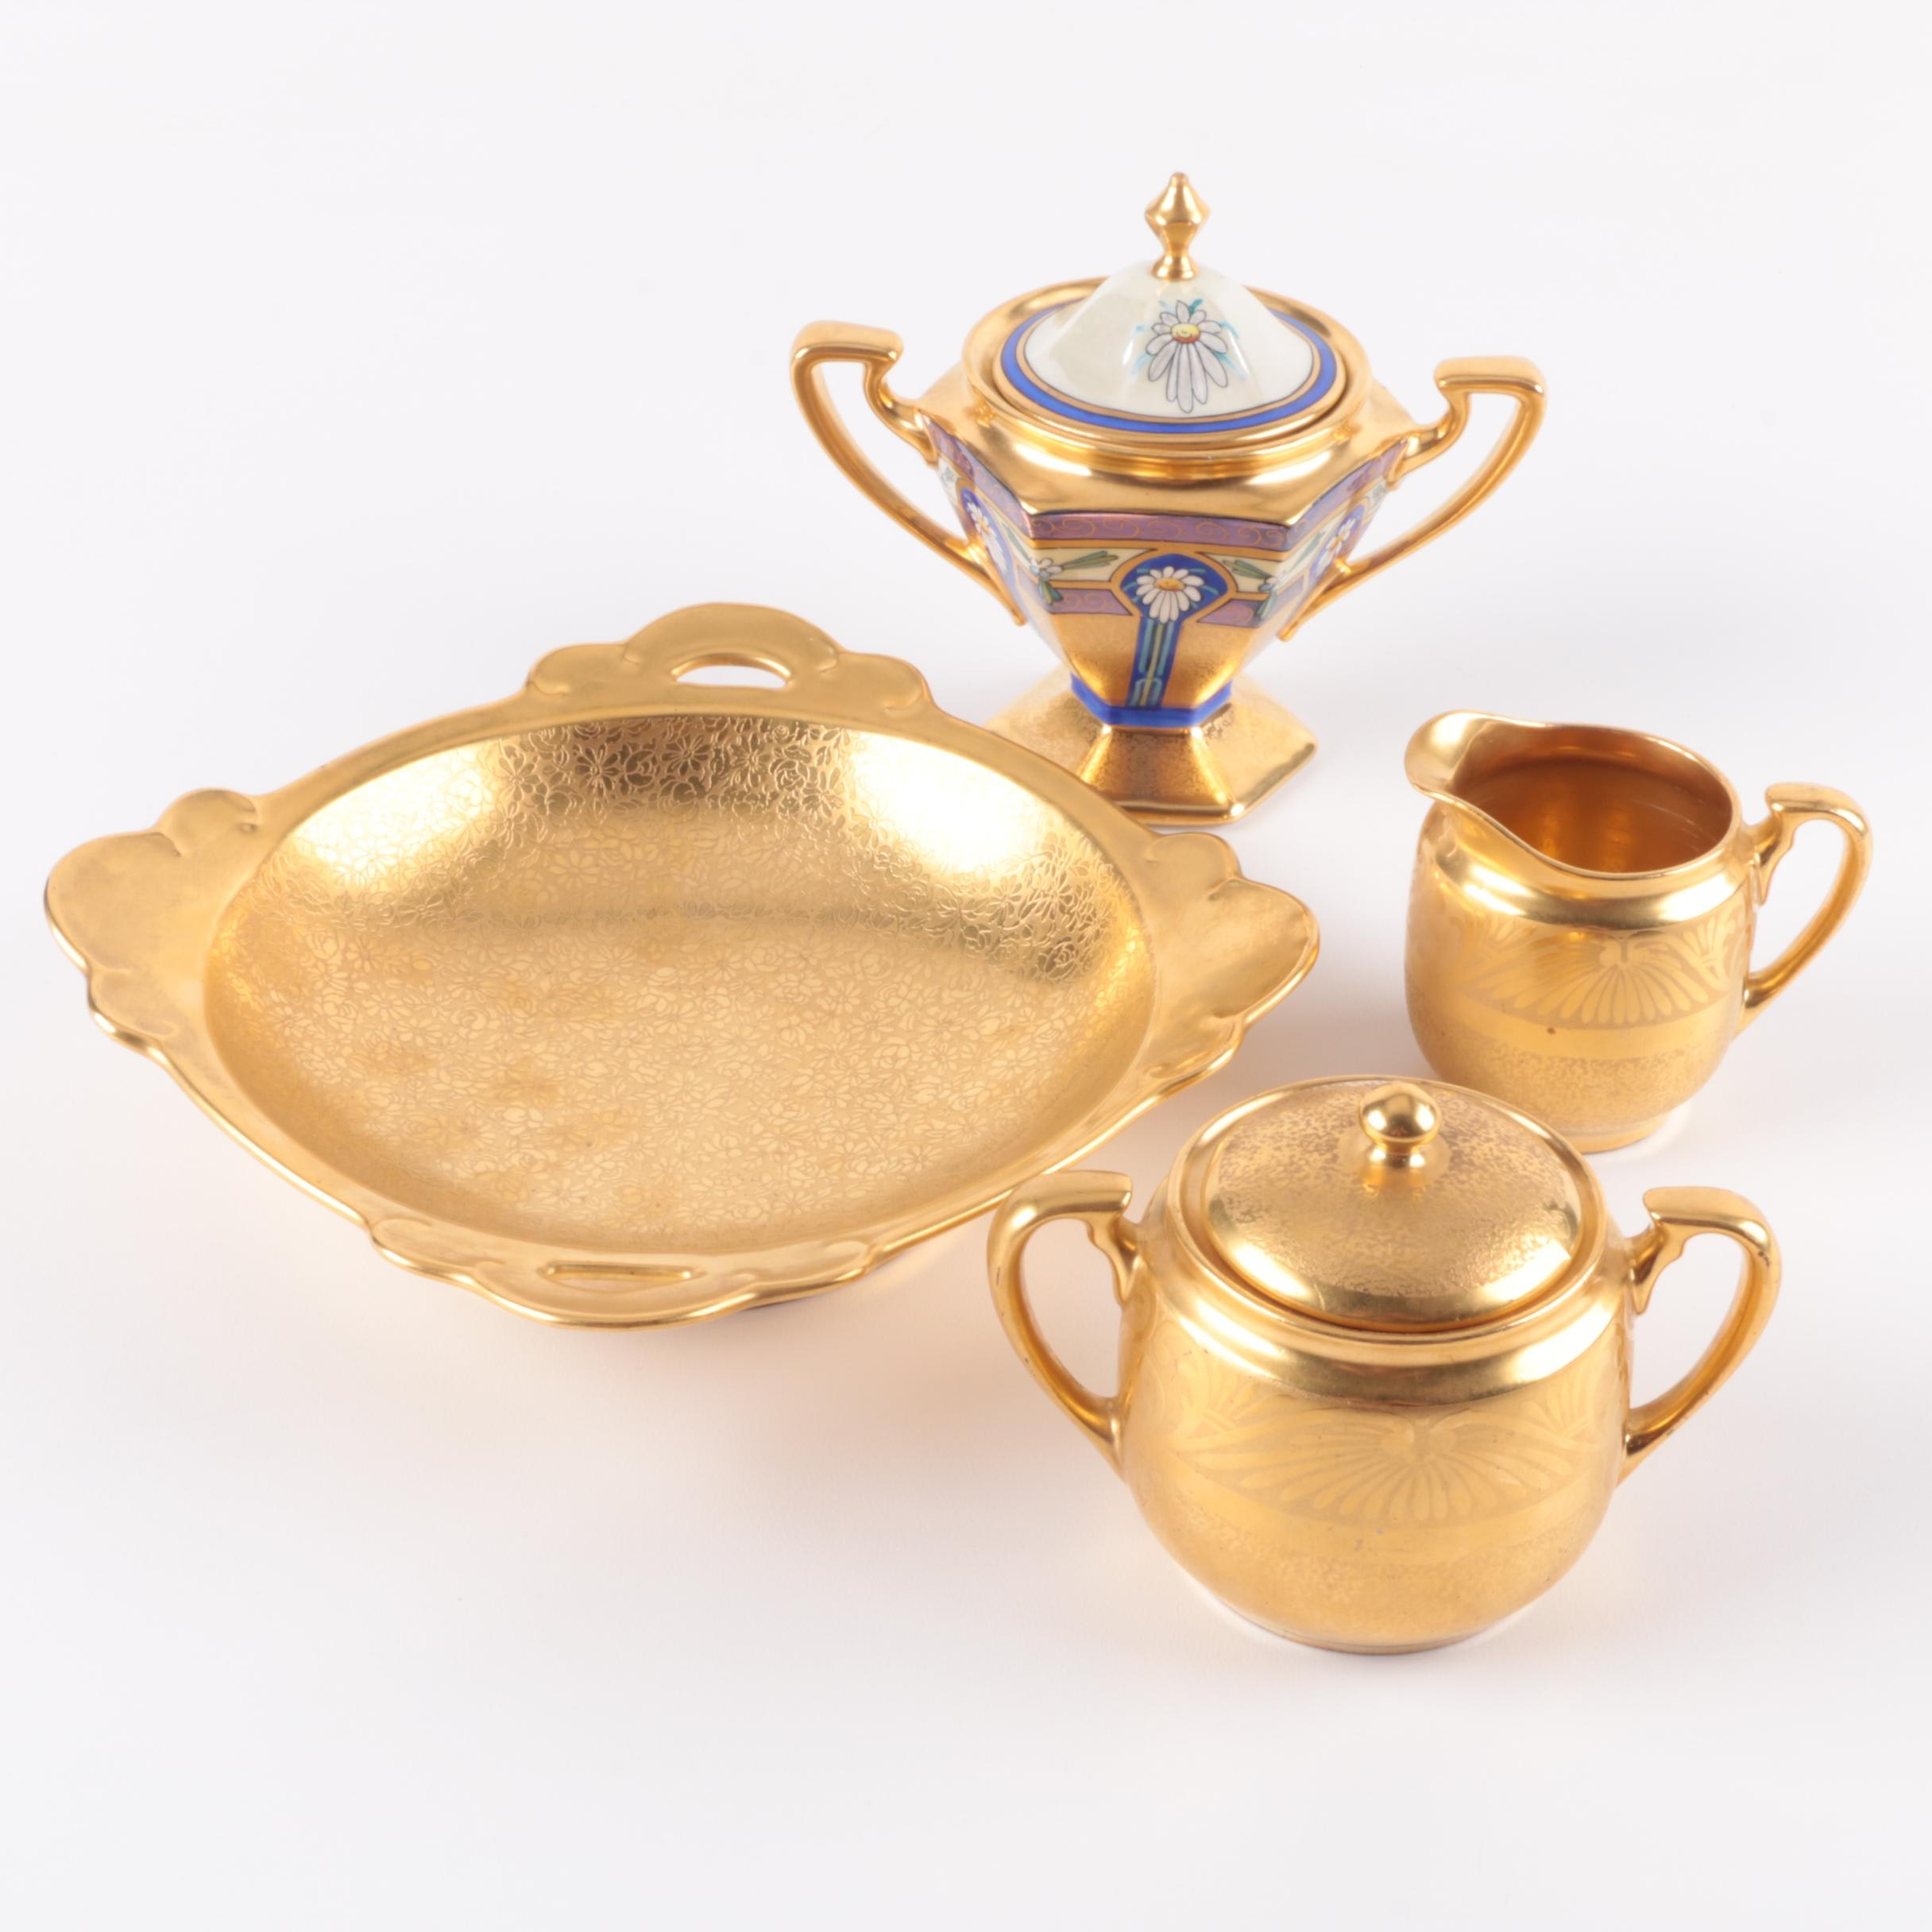 Vintage Pickard China Gold Encrusted Serveware